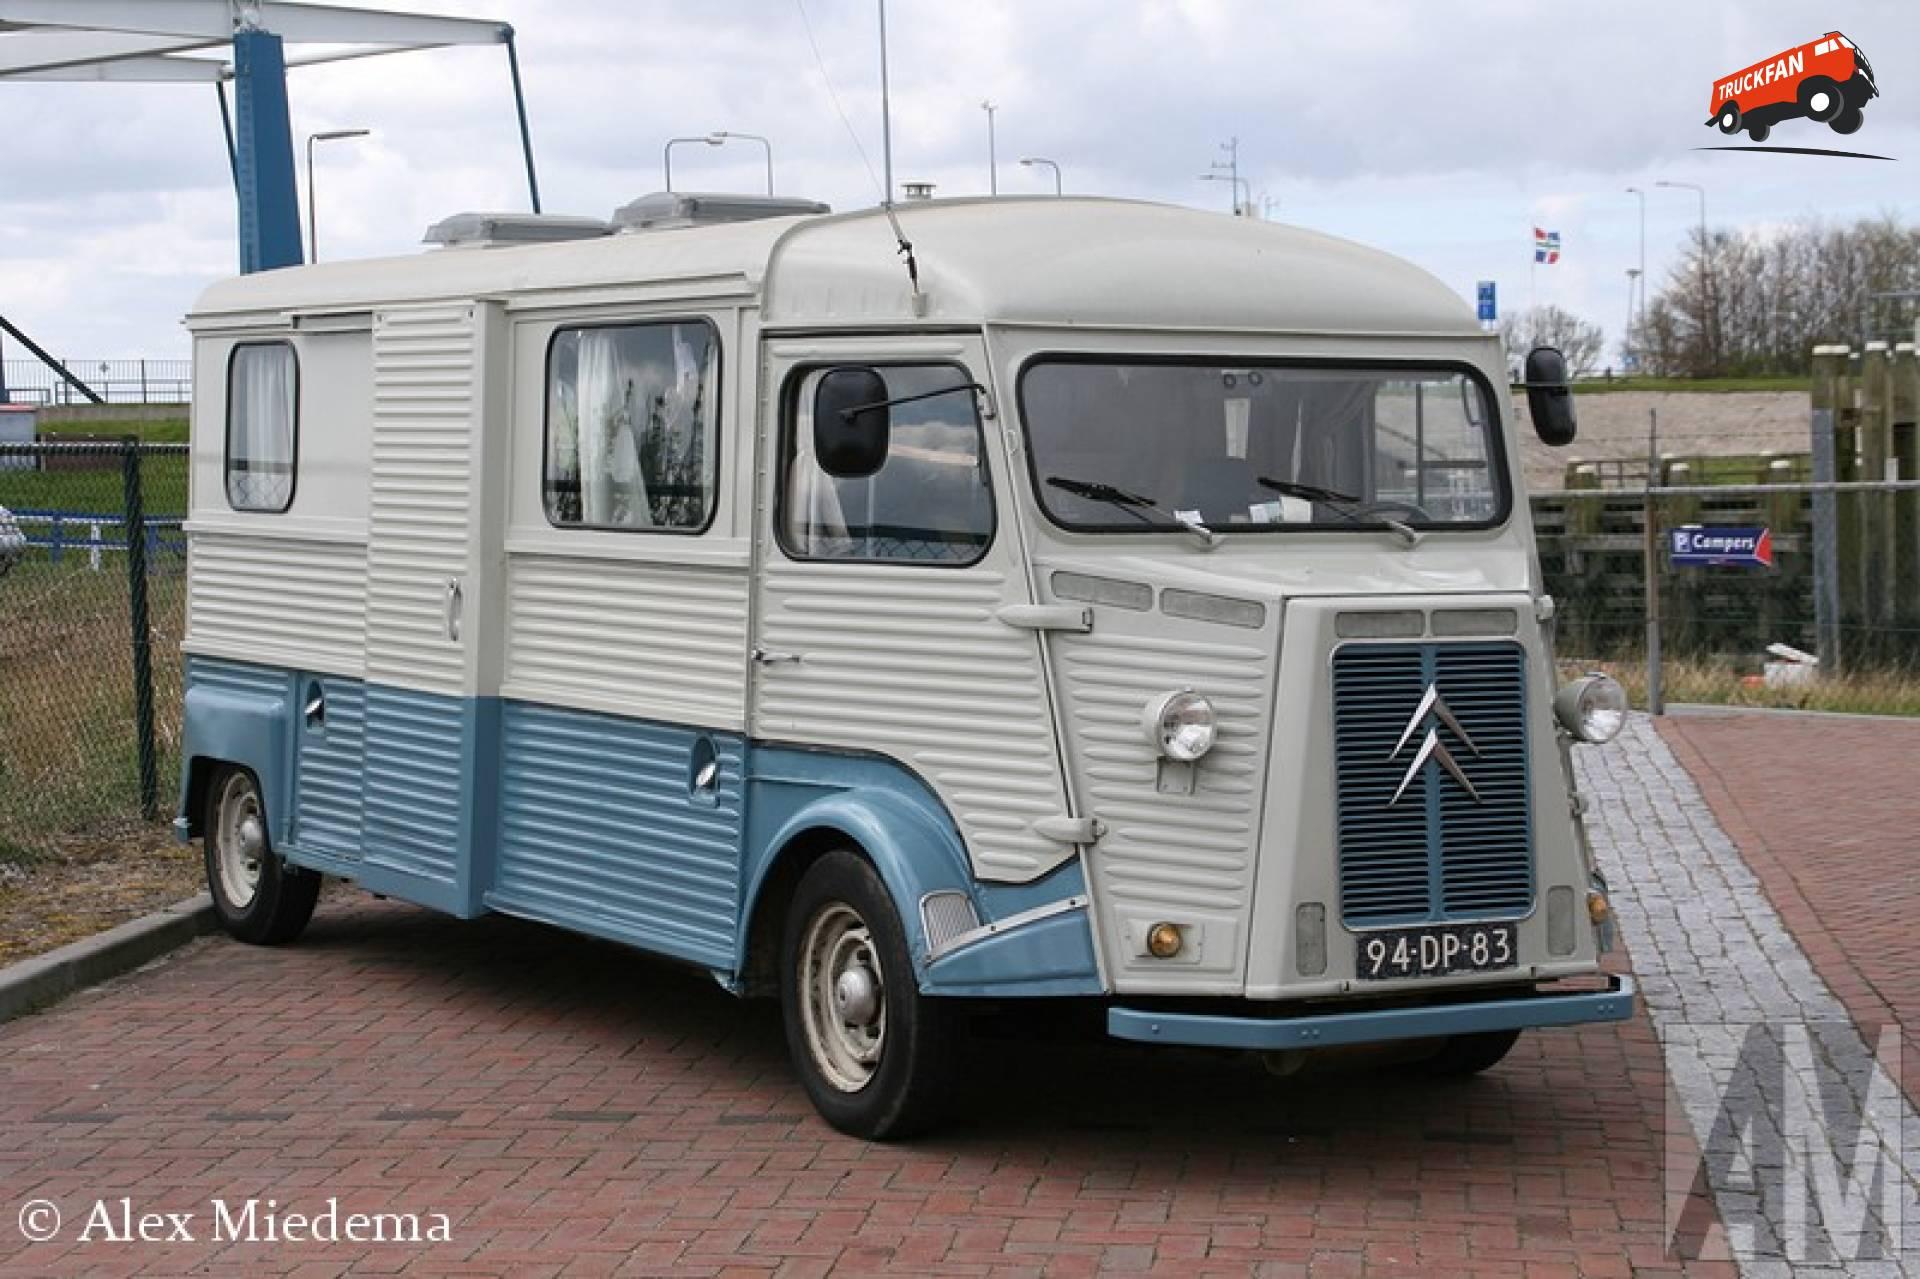 Citroen Hy Camper Van 1958 Picture 6 Of Diy Truck Pinterest Vans And Cars